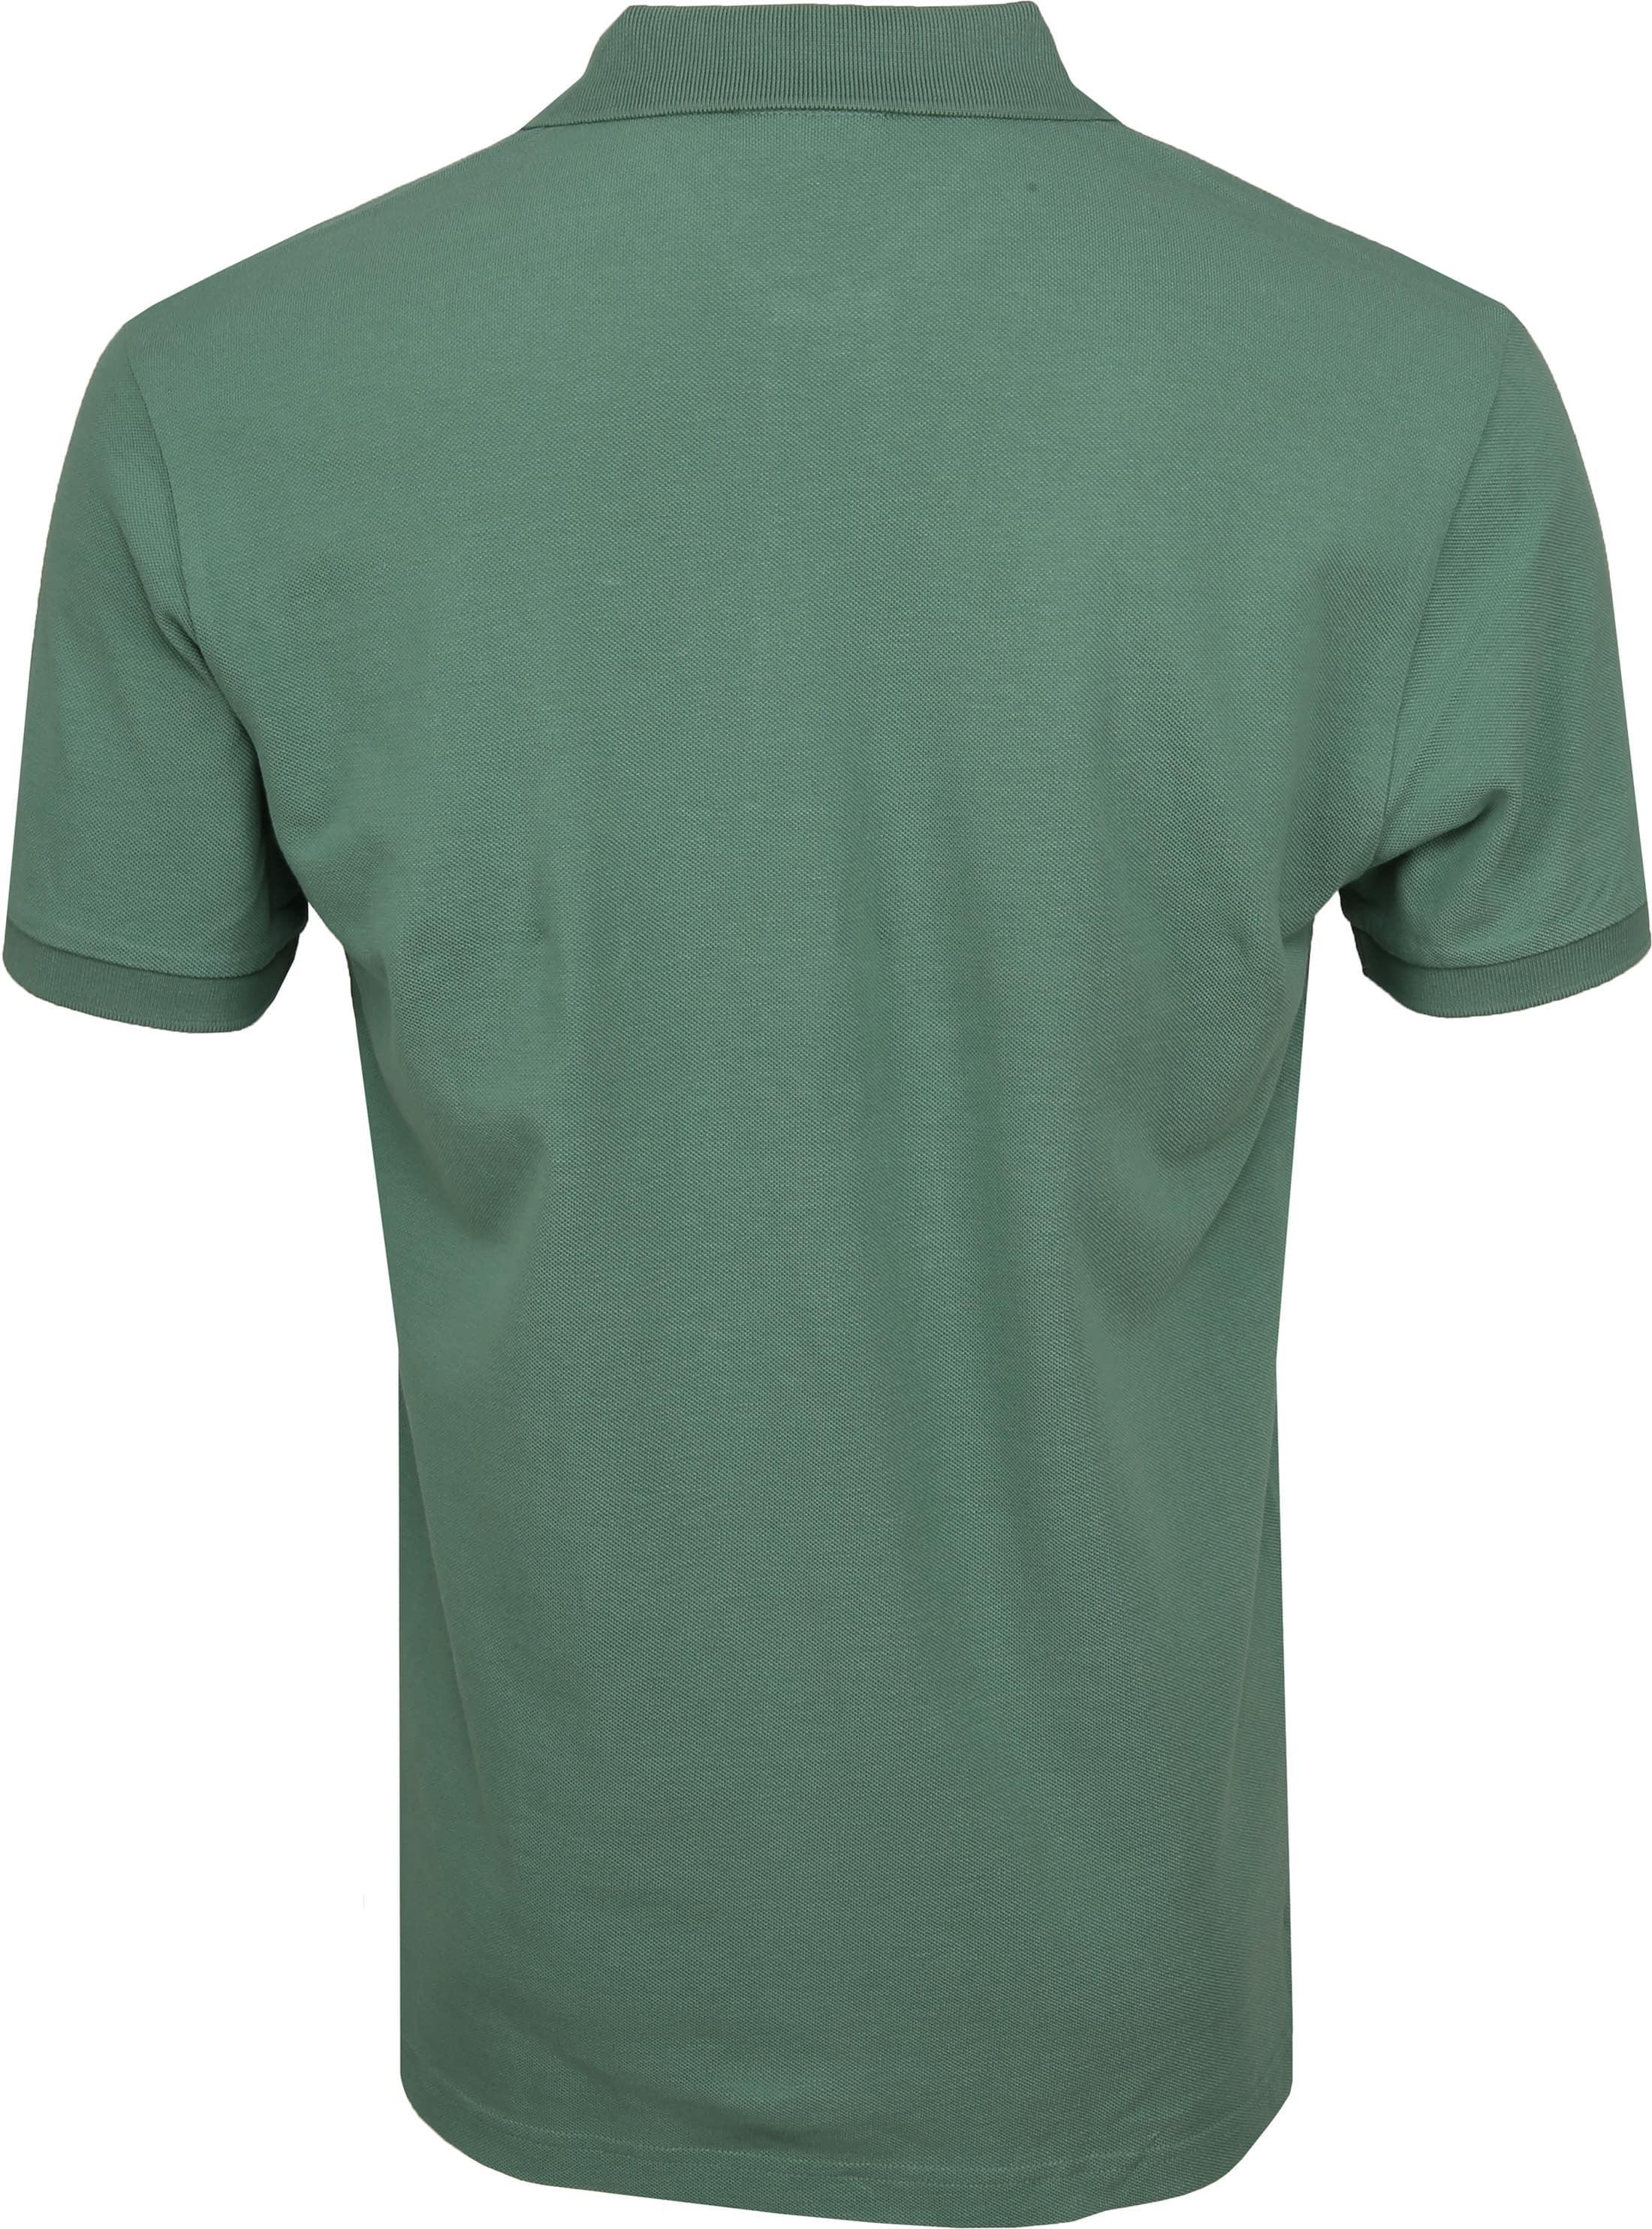 Profuomo Short Sleeve Poloshirt Grün foto 3